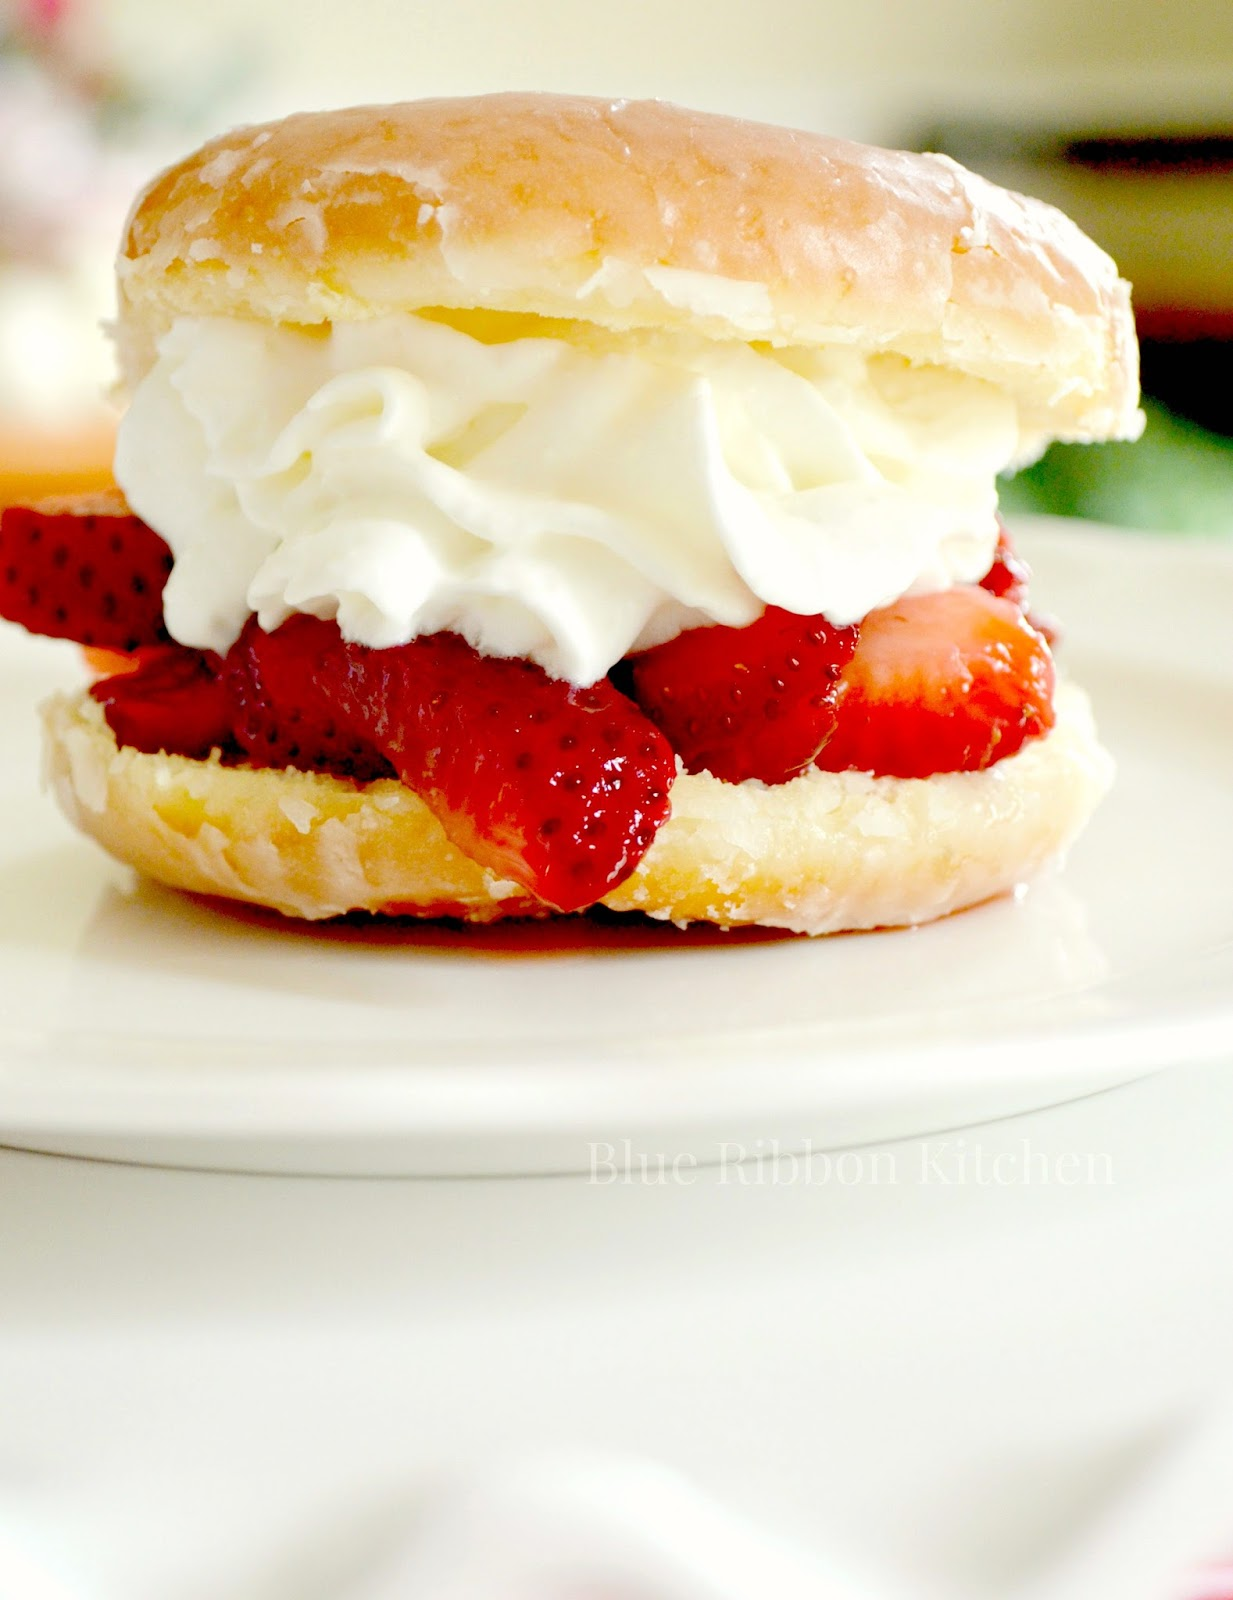 Blue Ribbon Kitchen: Strawberry Doughnut Shortcake & her ...